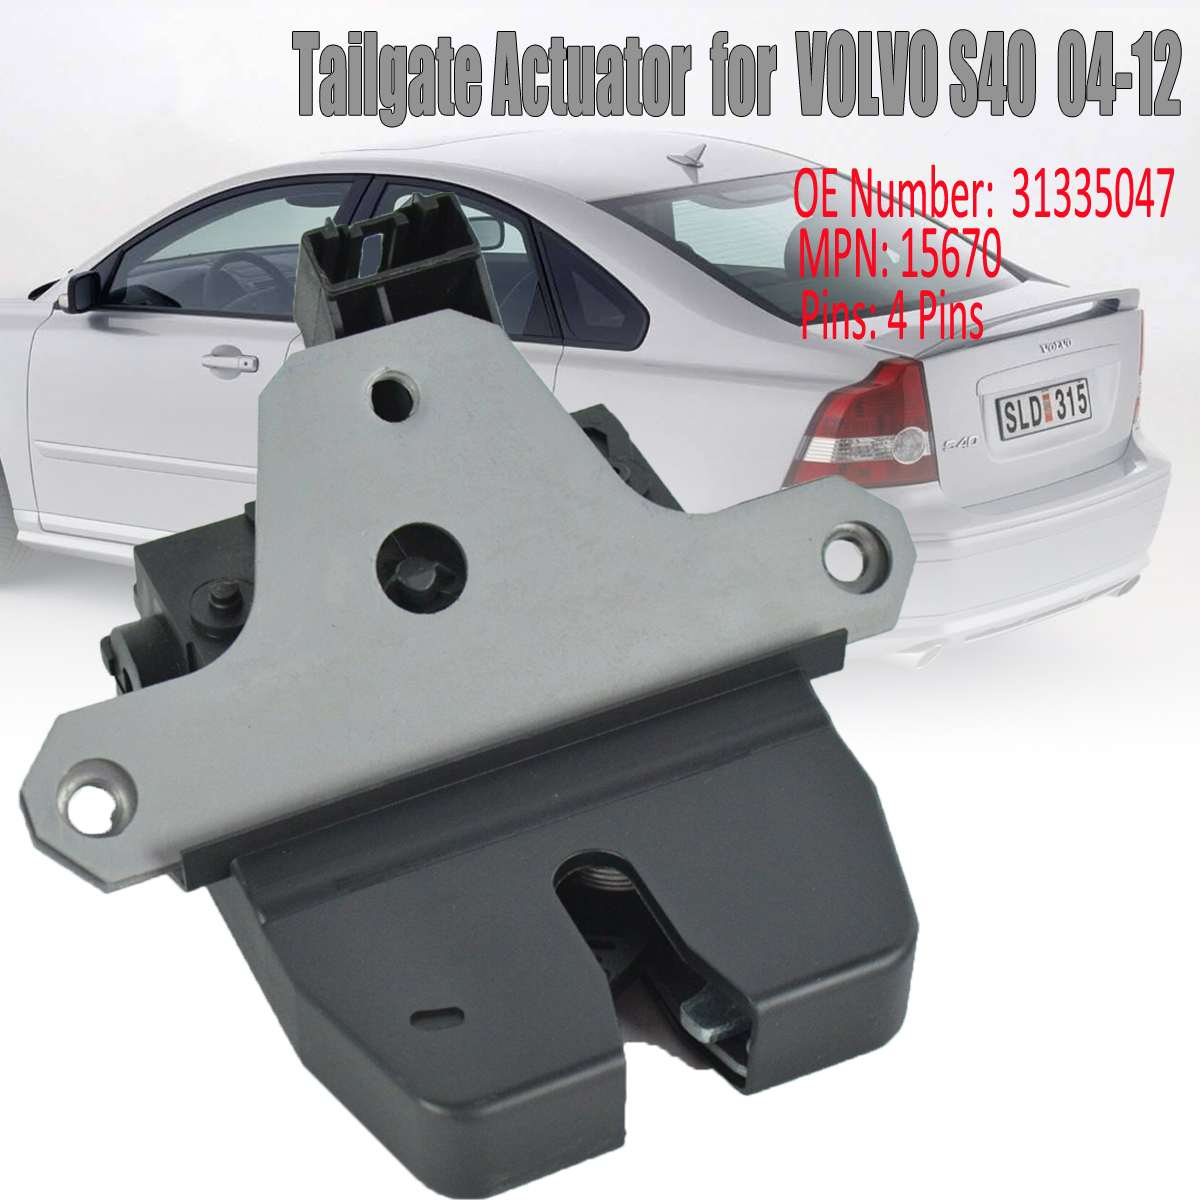 Hatchback Renault Laguna II 01-07 Tailgate Bootlid Rubber Seal